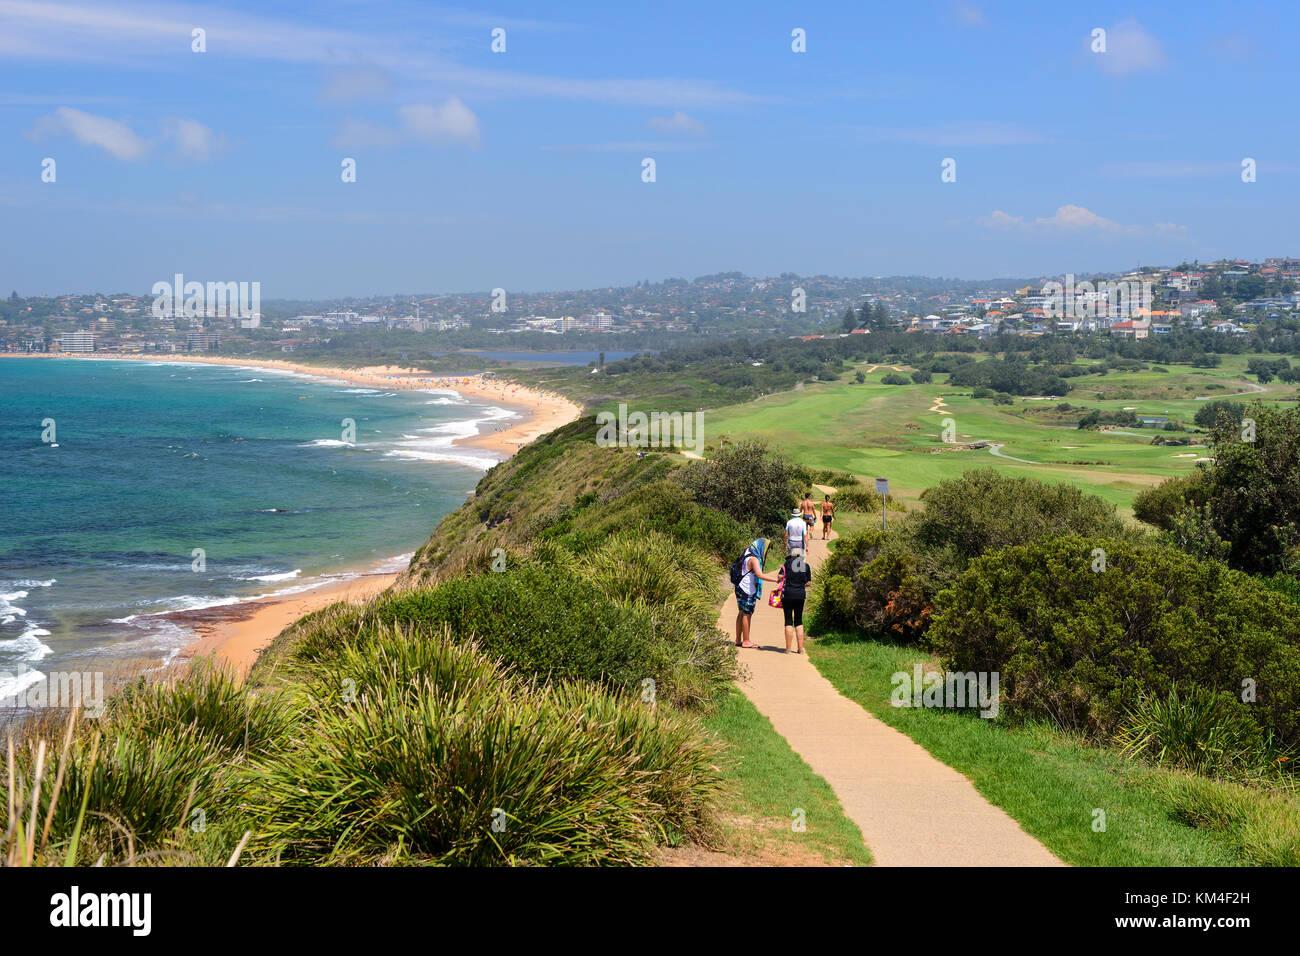 Bicentennial Coastal Walk beside Long Reef Beach at Collaroy, a northern suburb of Sydney, New South Wales, Australia - Stock Image